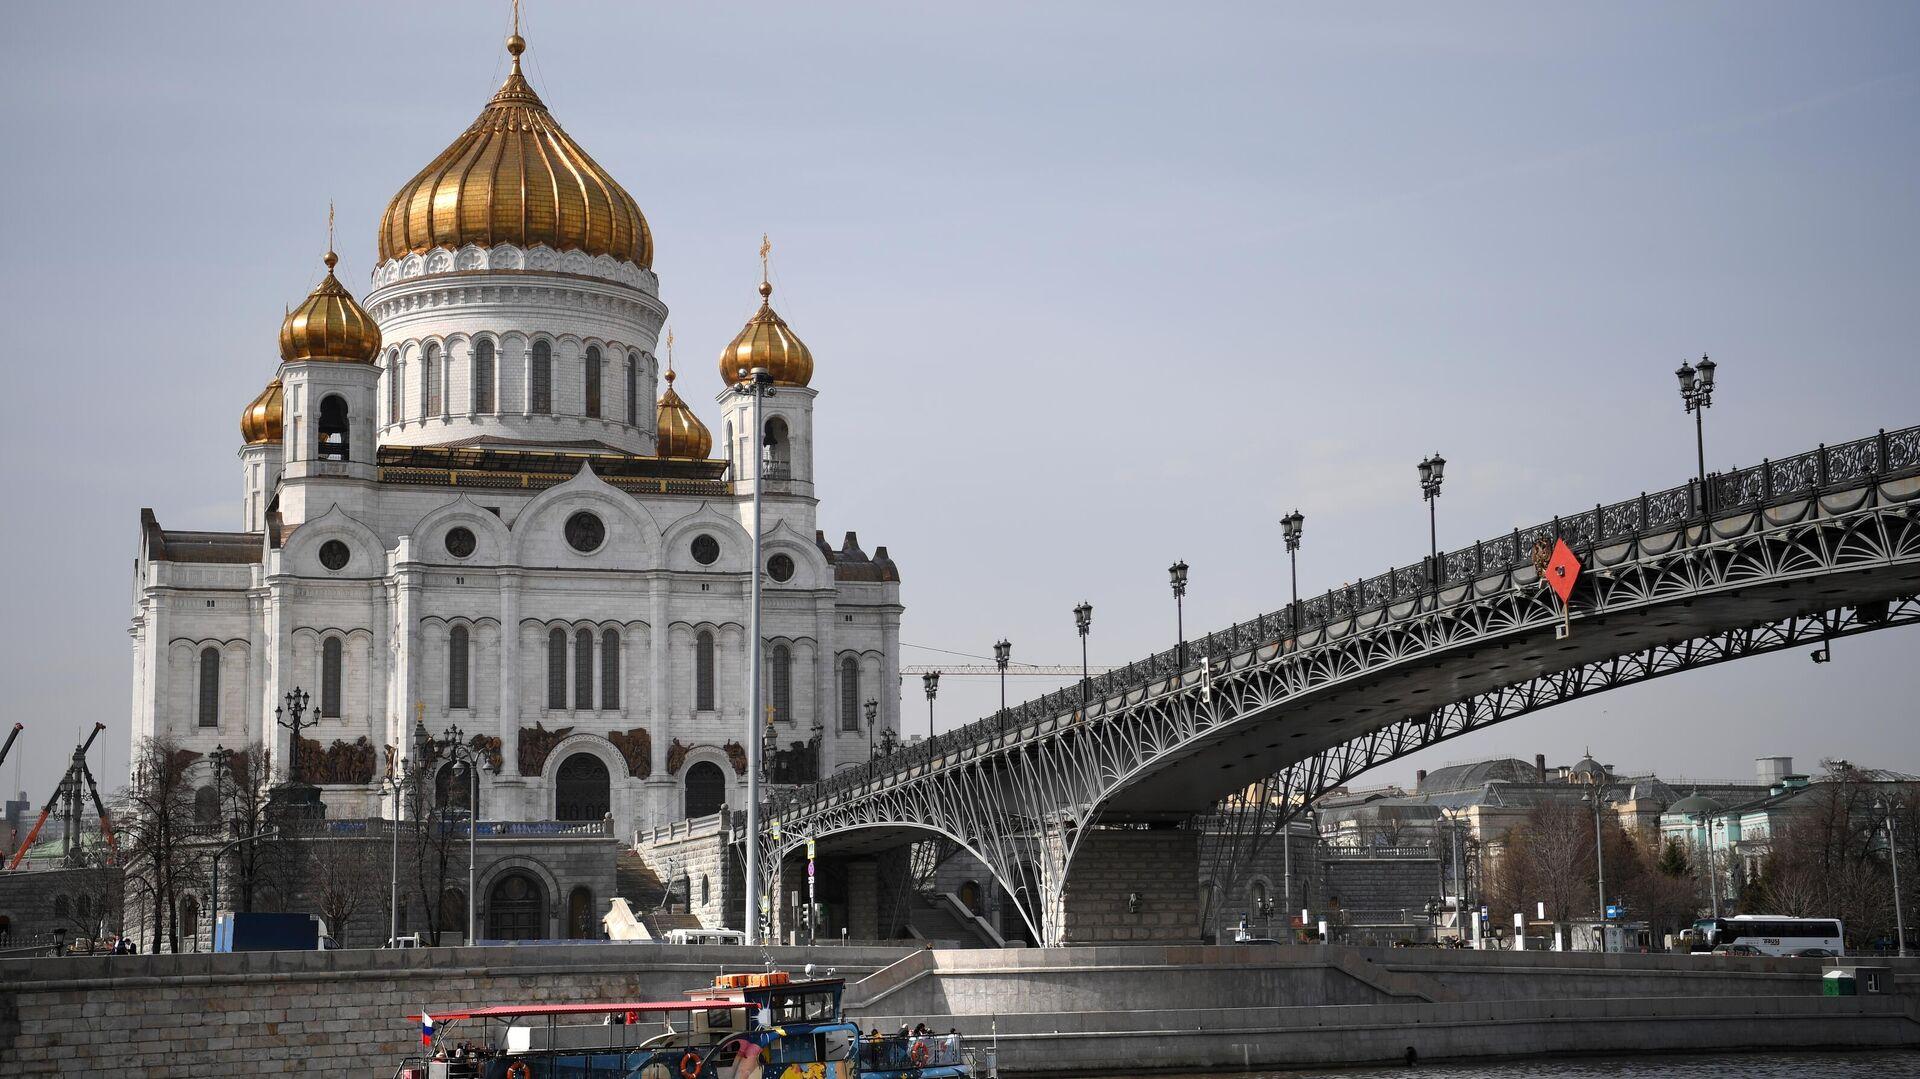 Храм Христа Спасителя в Москве - РИА Новости, 1920, 13.09.2021